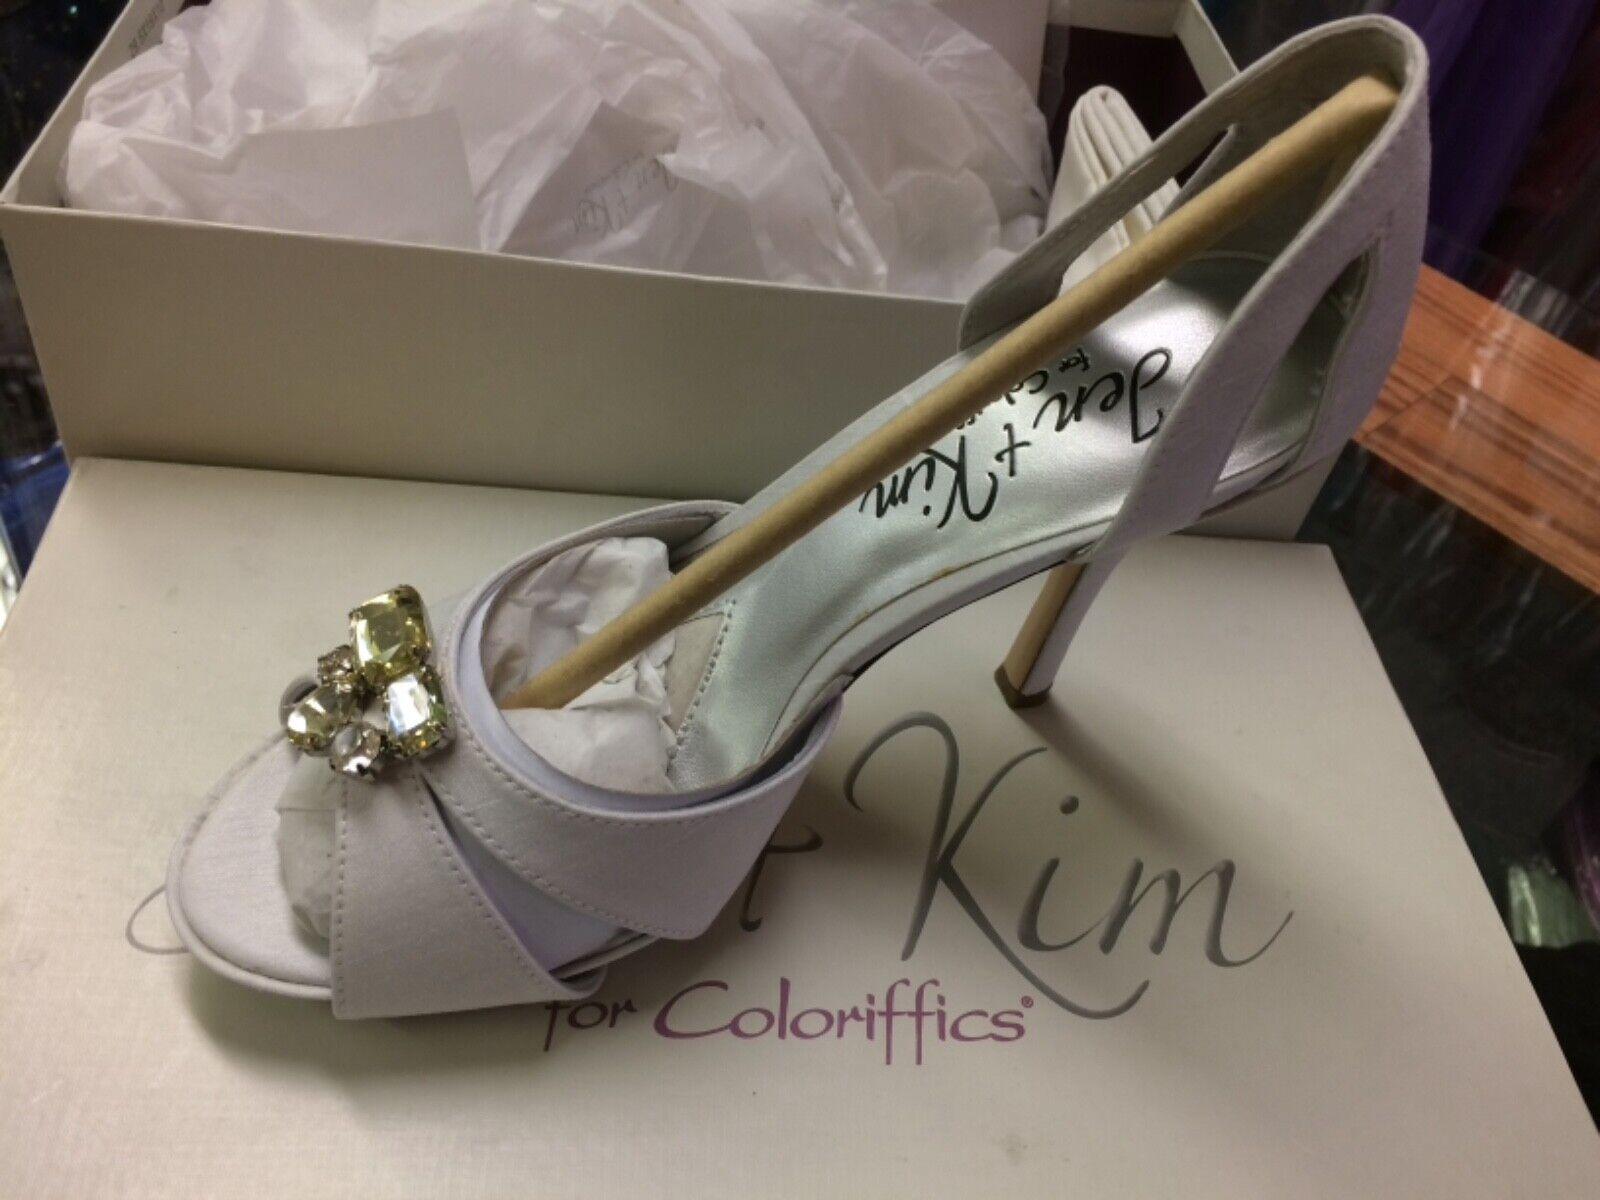 Jen+Kim by Coloriffics Passion White Silk Crystals Brides Closed Sandal 10 M